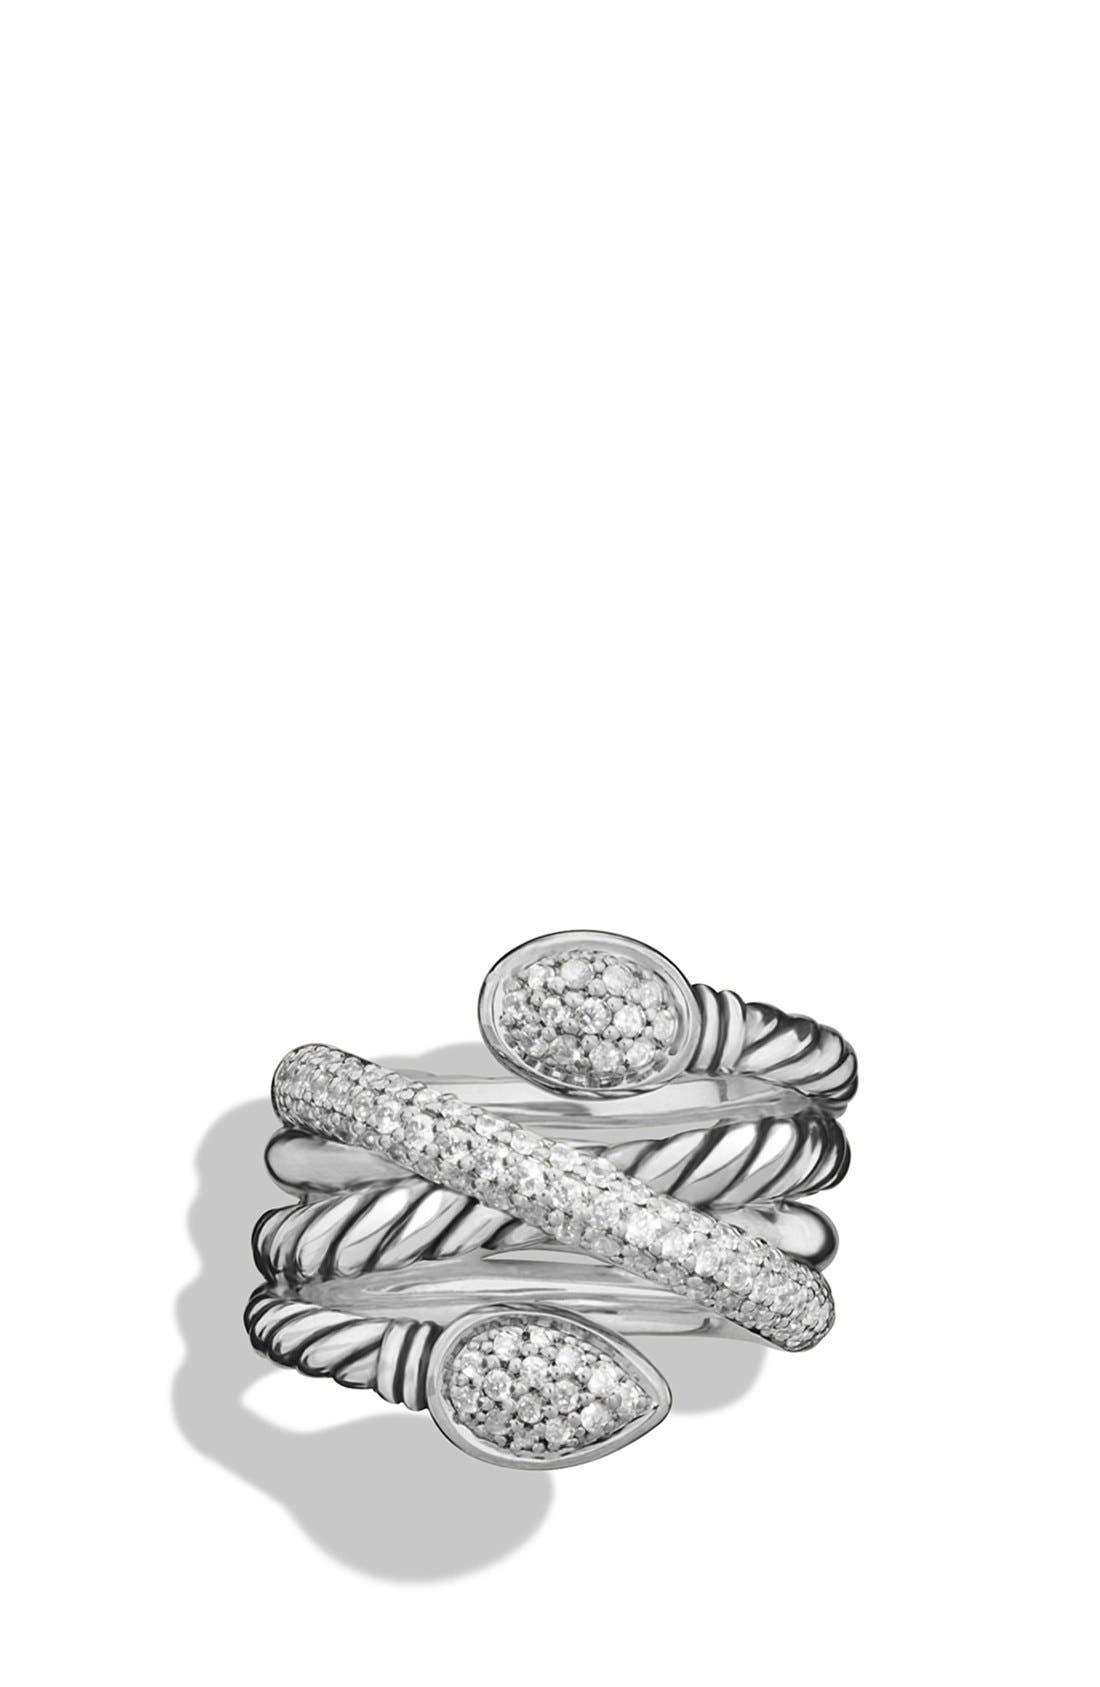 DAVID YURMAN Renaissance Ring with Diamonds